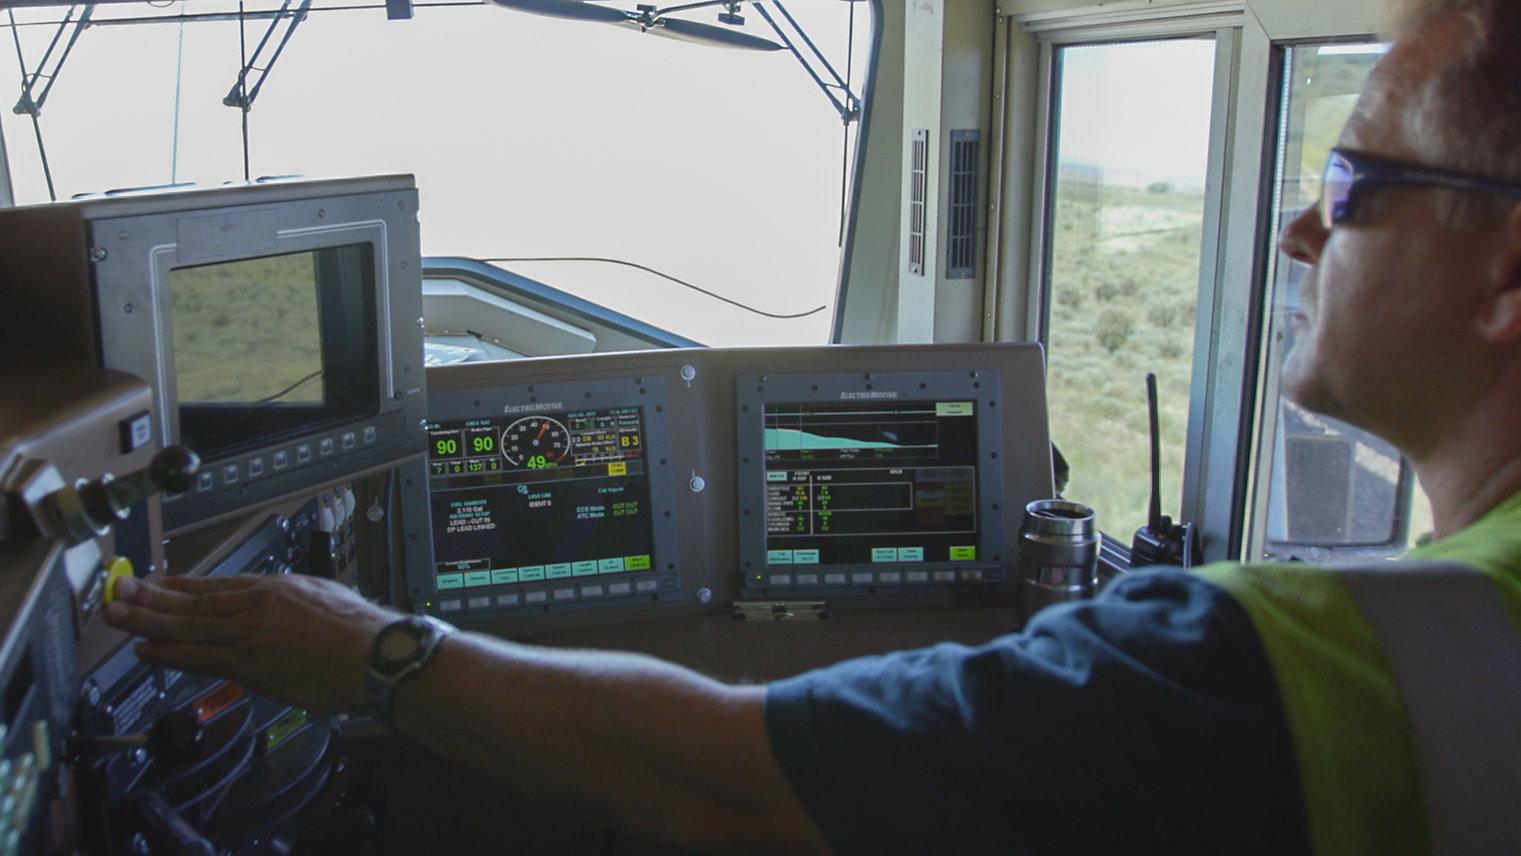 Locomotive Electronics